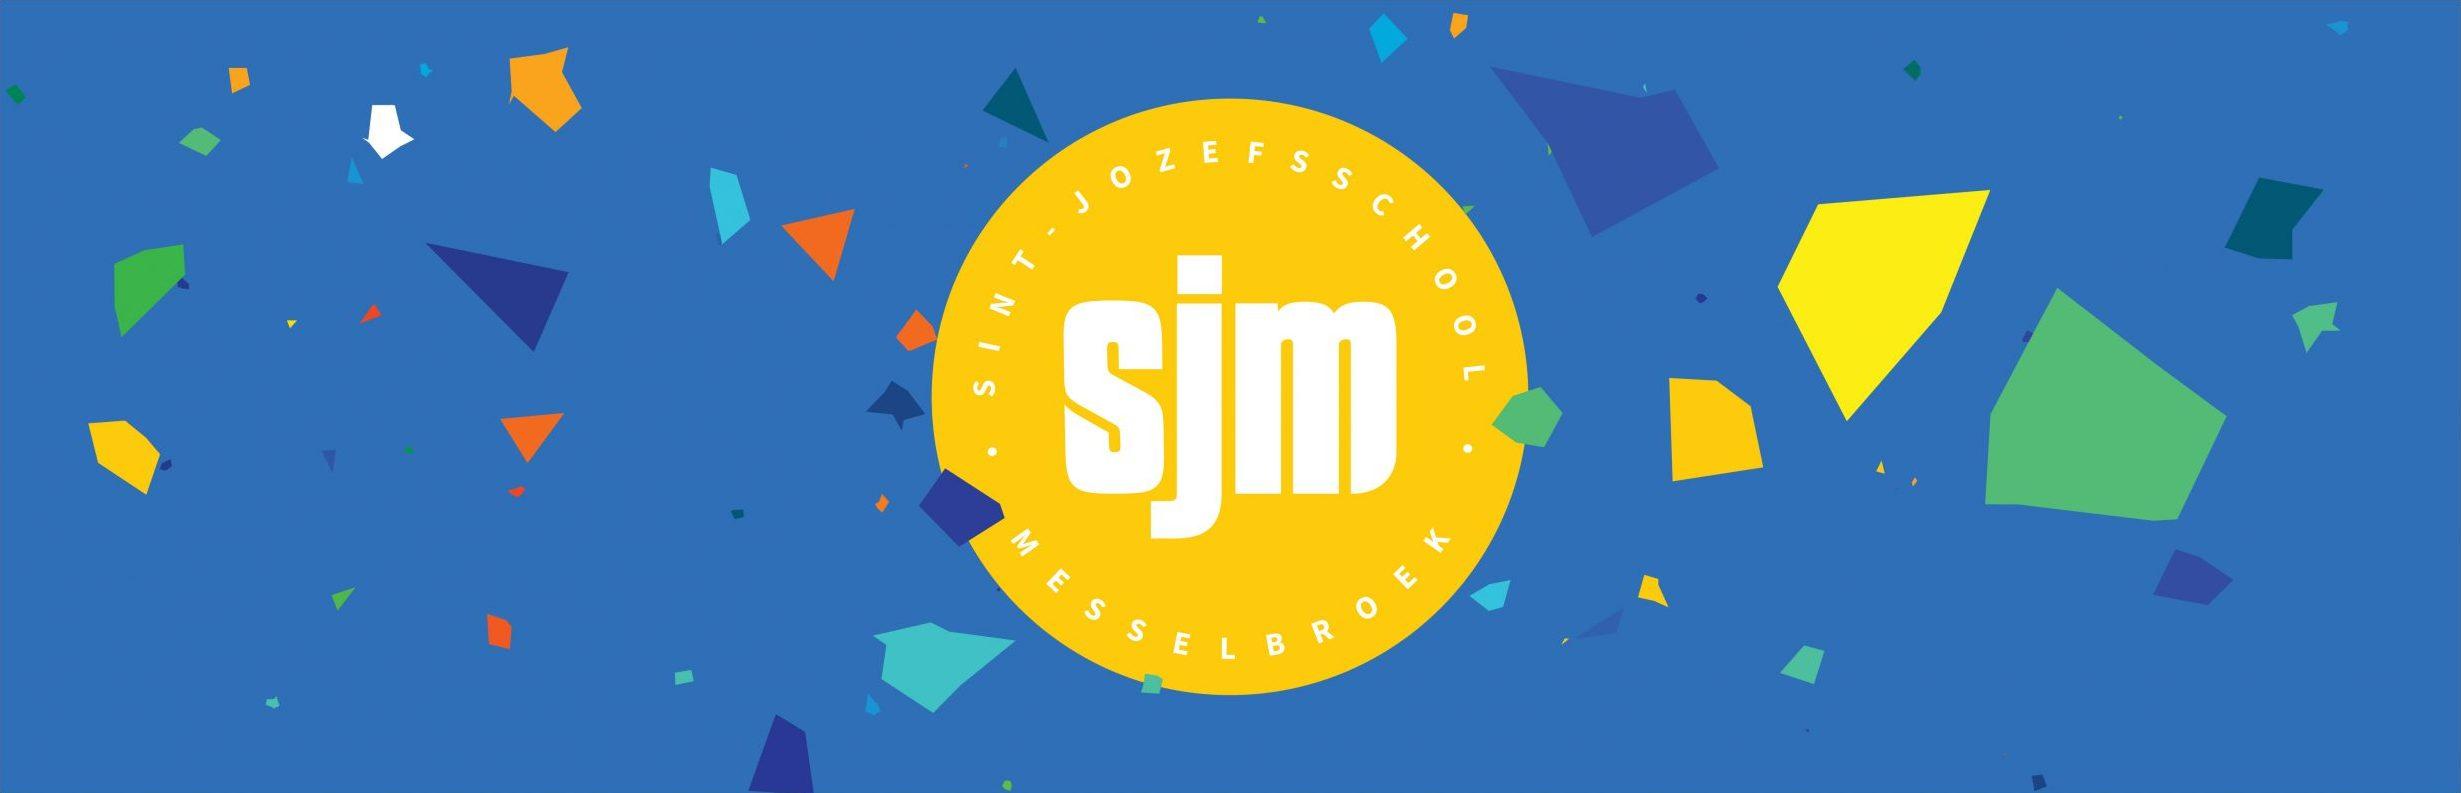 Sint-Jozefsschool Messelbroek logo